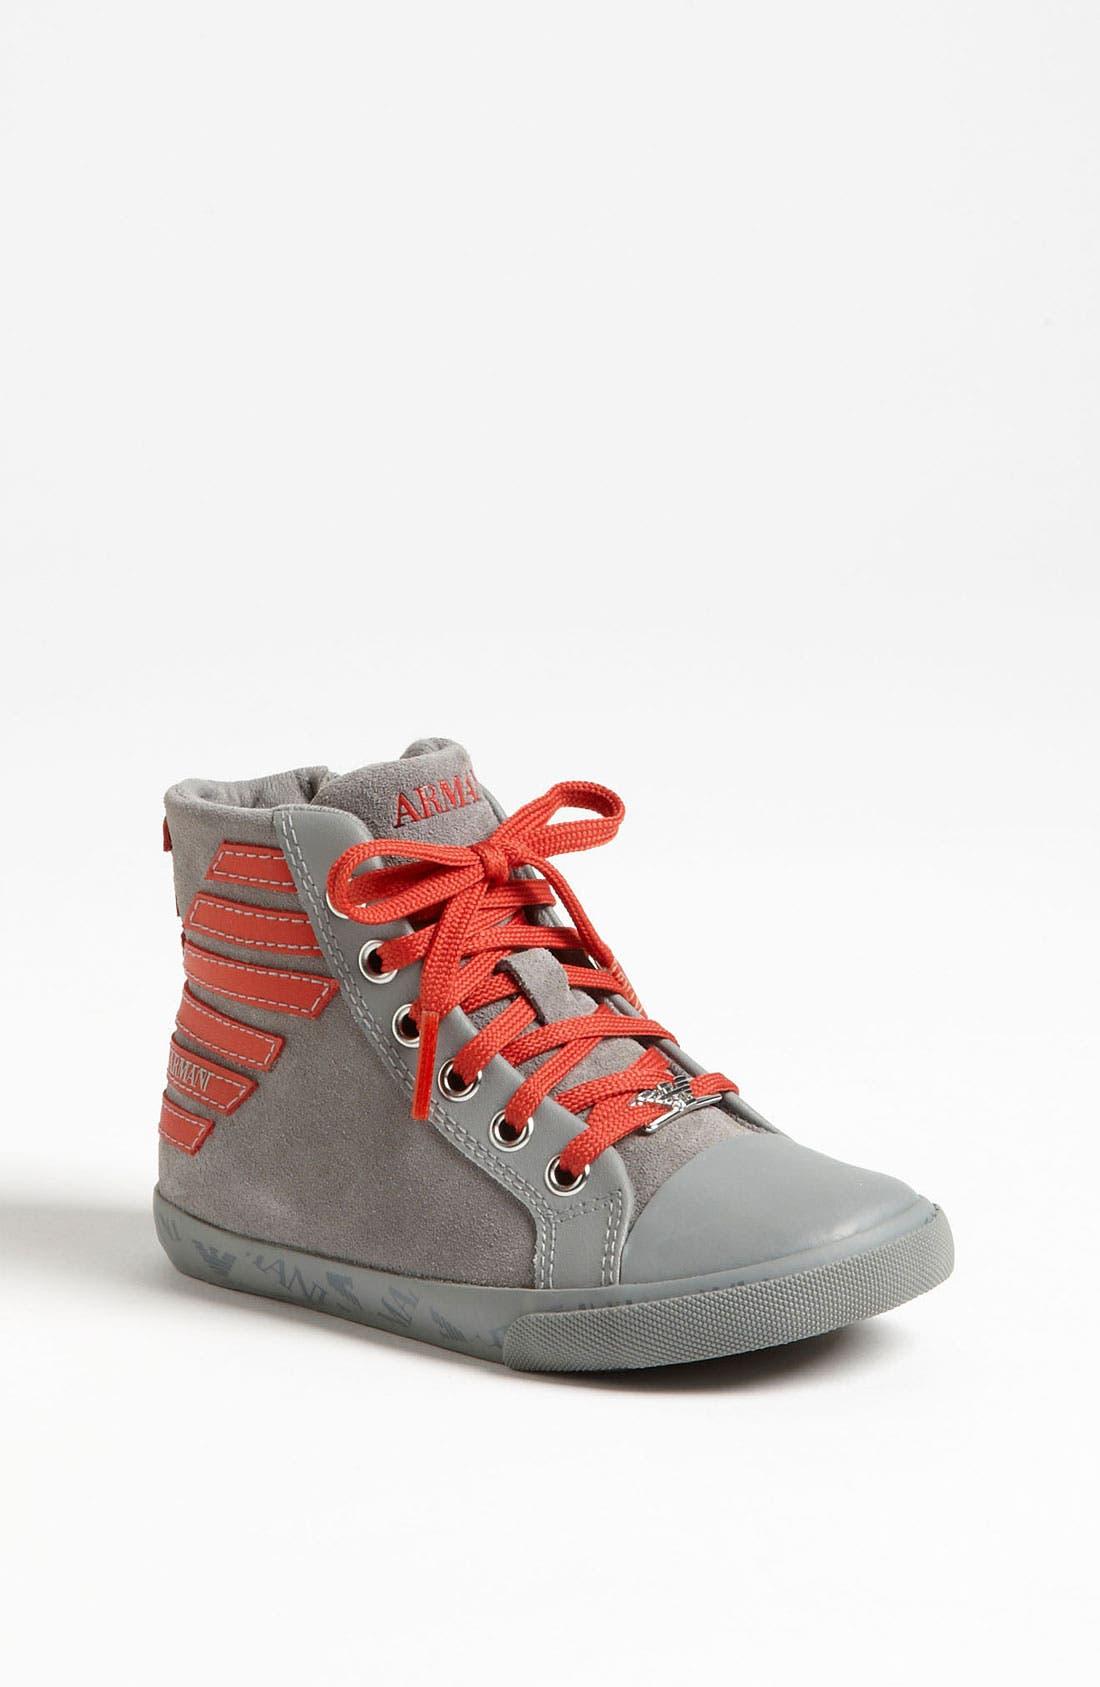 Main Image - Armani Junior 'Eagle' Sneaker (Walker & Toddler)